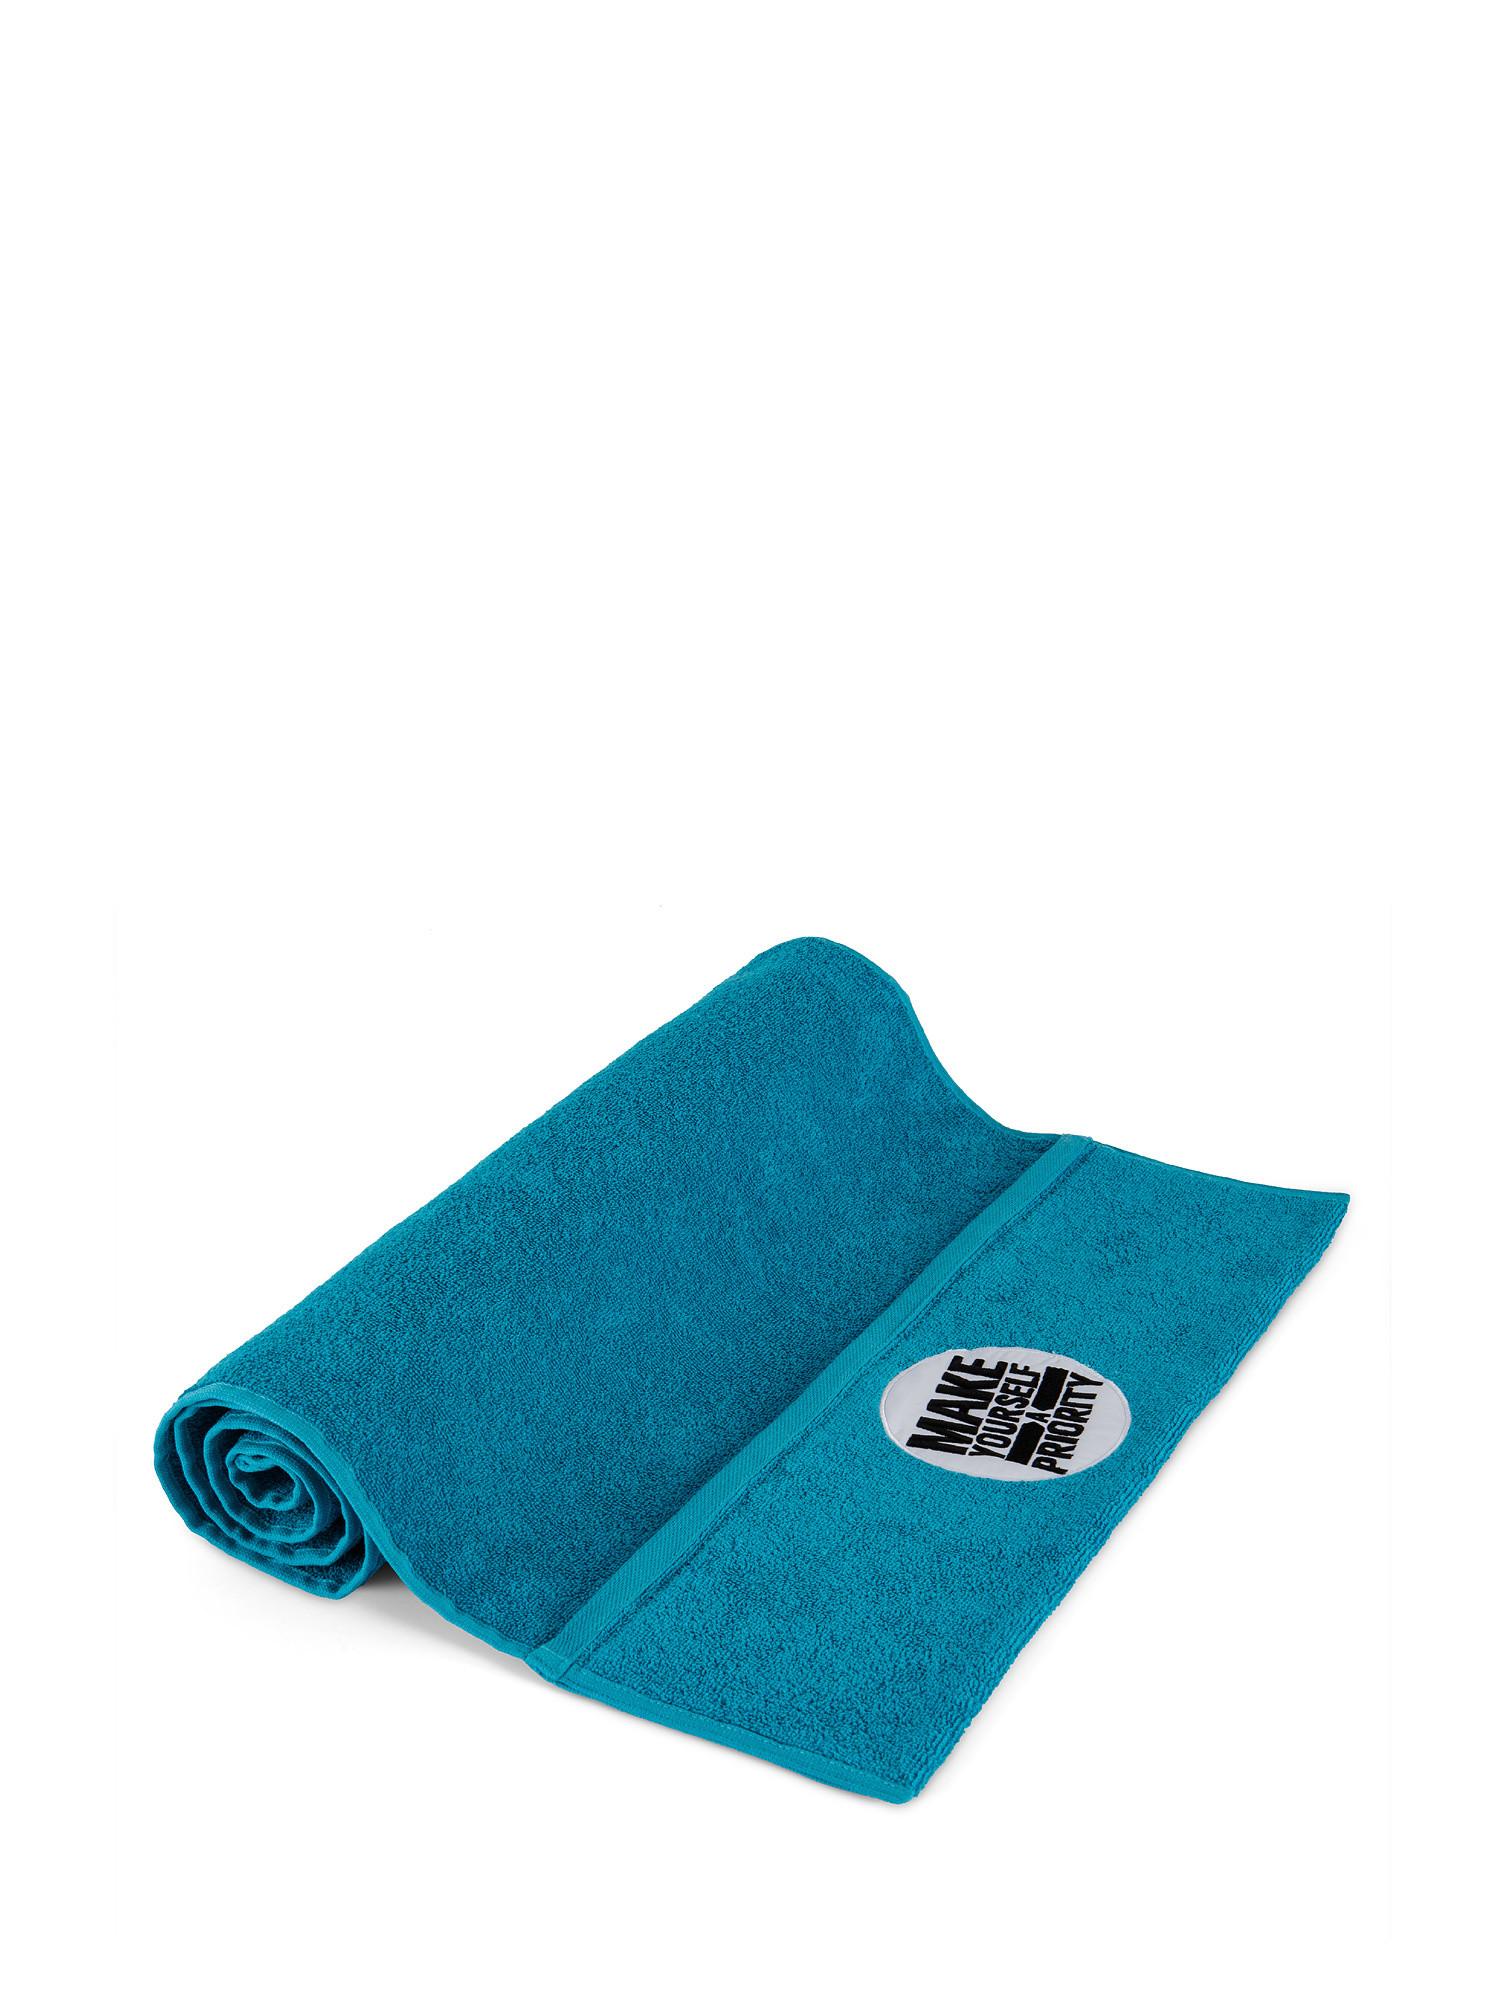 Asciugamano da palestra e fitness, Azzurro, large image number 0